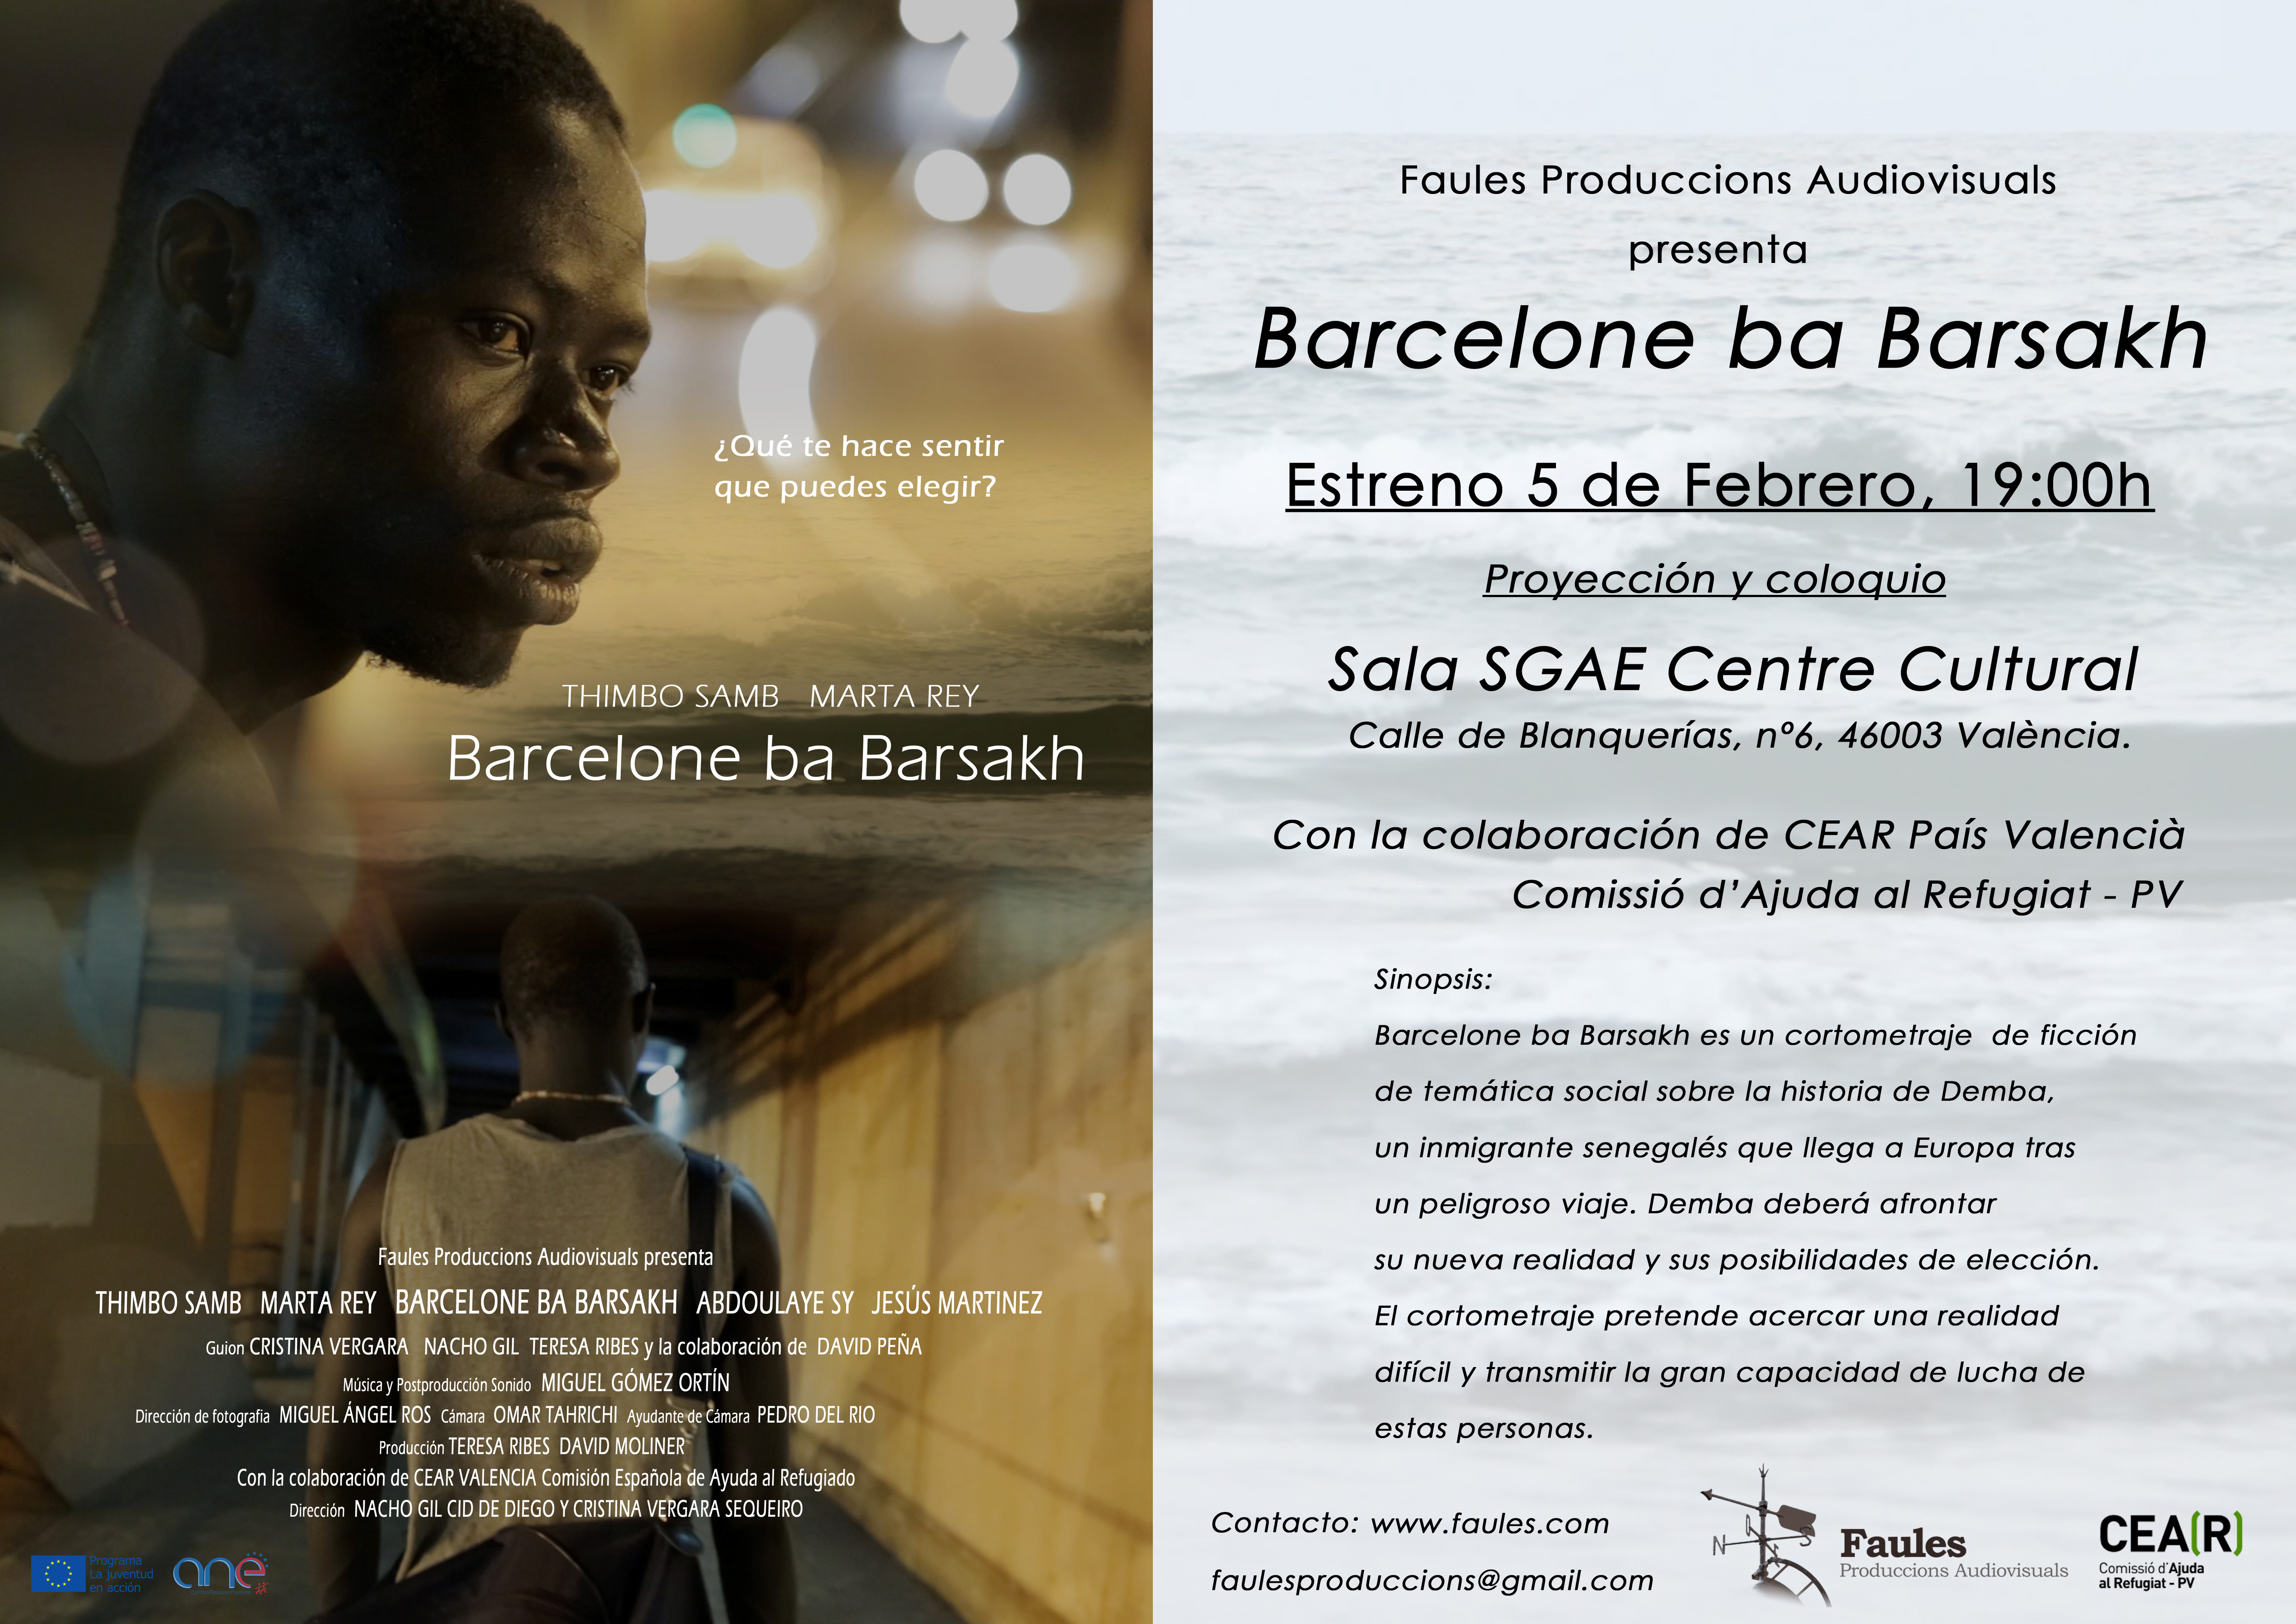 Estreno Barcelone ba Barsakh - 5 Febrero SGAE